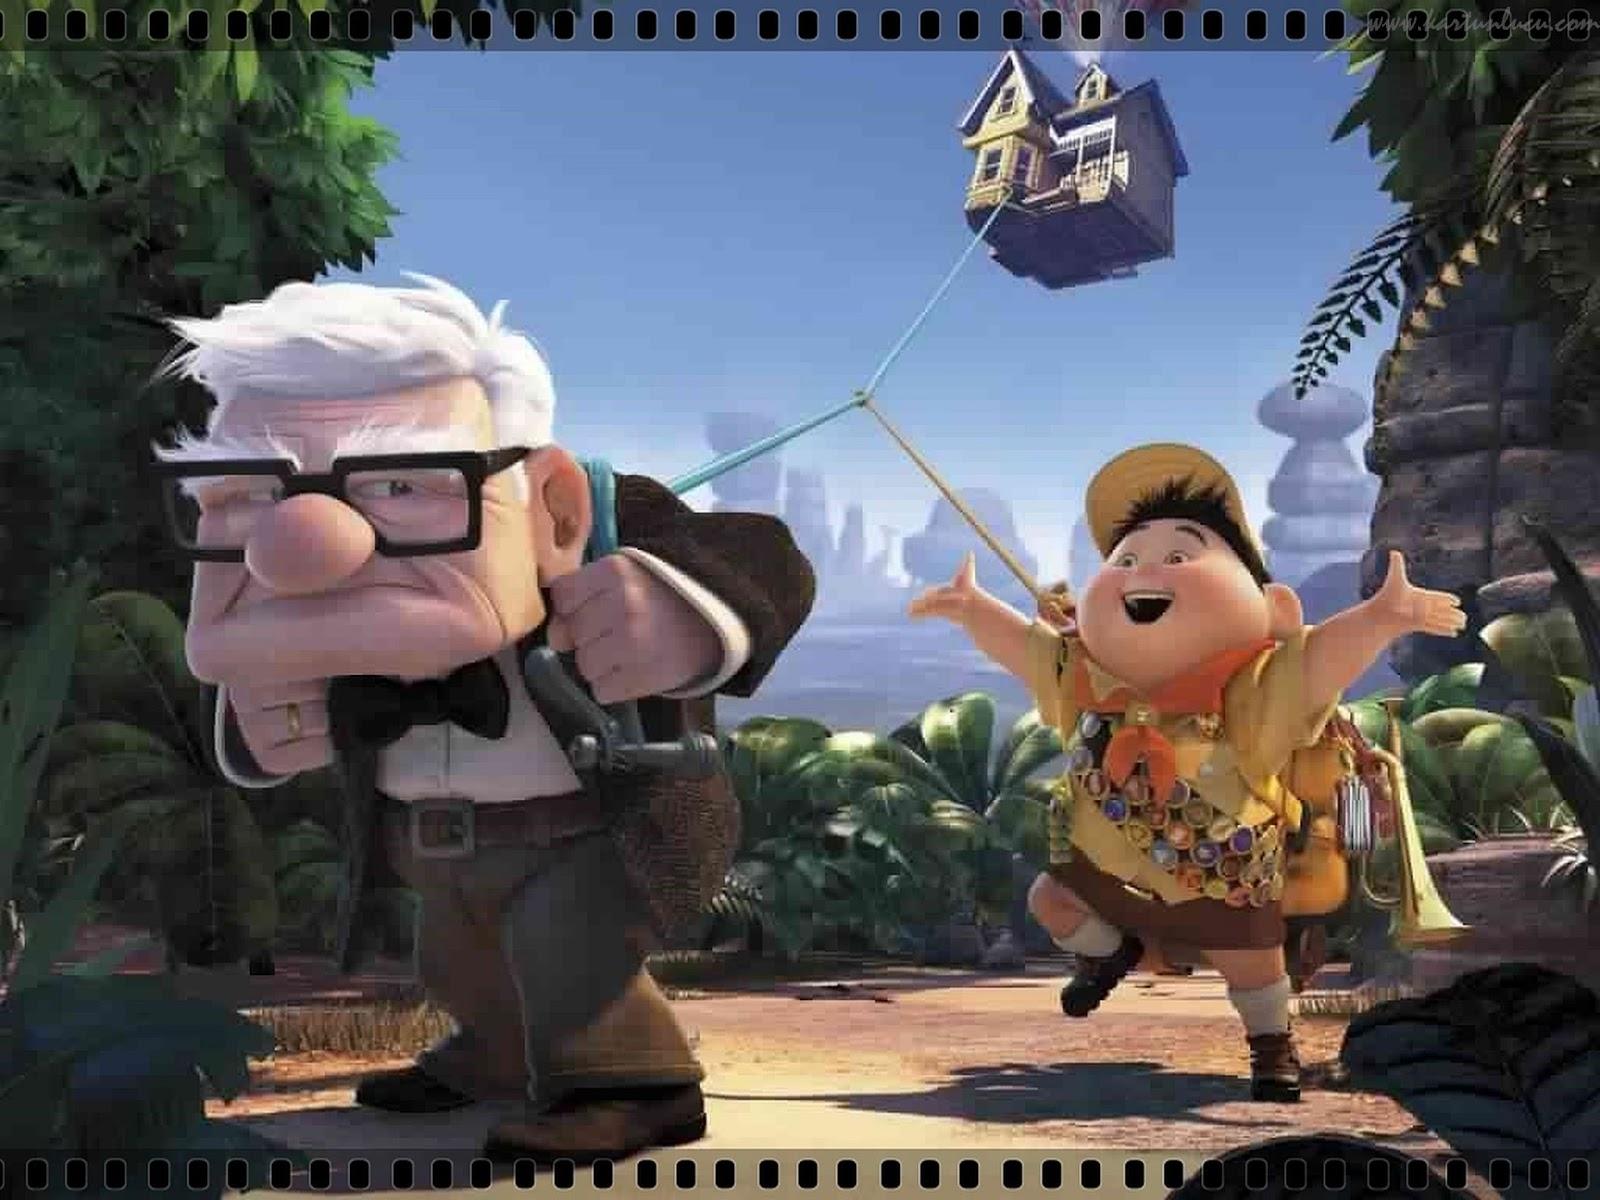 Film Kartun Lucu Related Keywords Suggestions Film Kartun Lucu